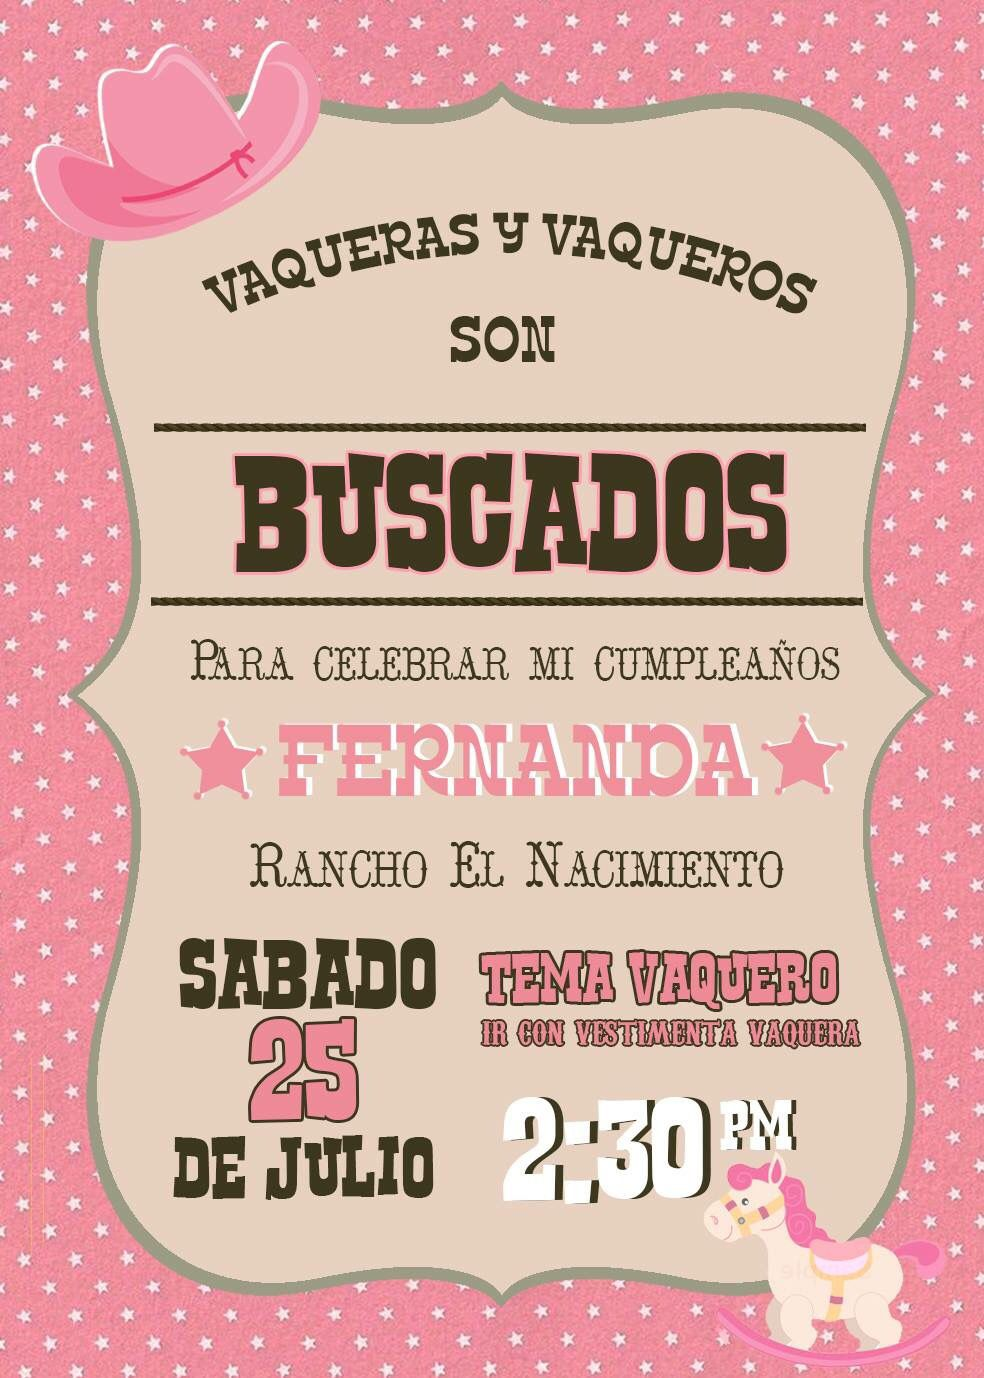 cumpleaños ainhoa … | genesis in 2019 | Fiesta cumpleaños ...